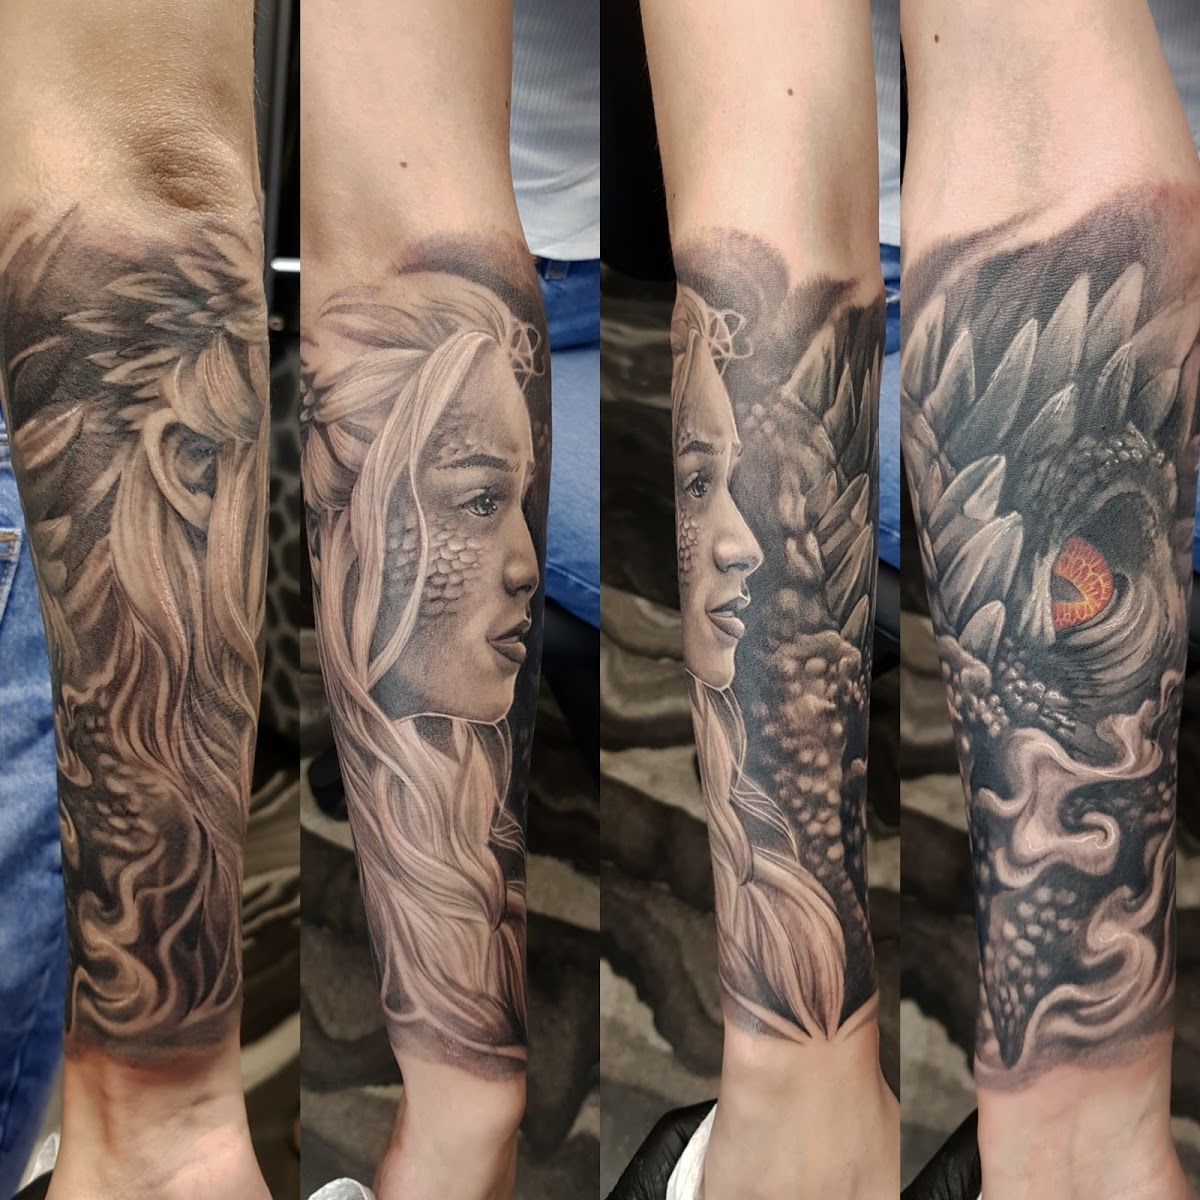 Tattoo-Drache-Portraet